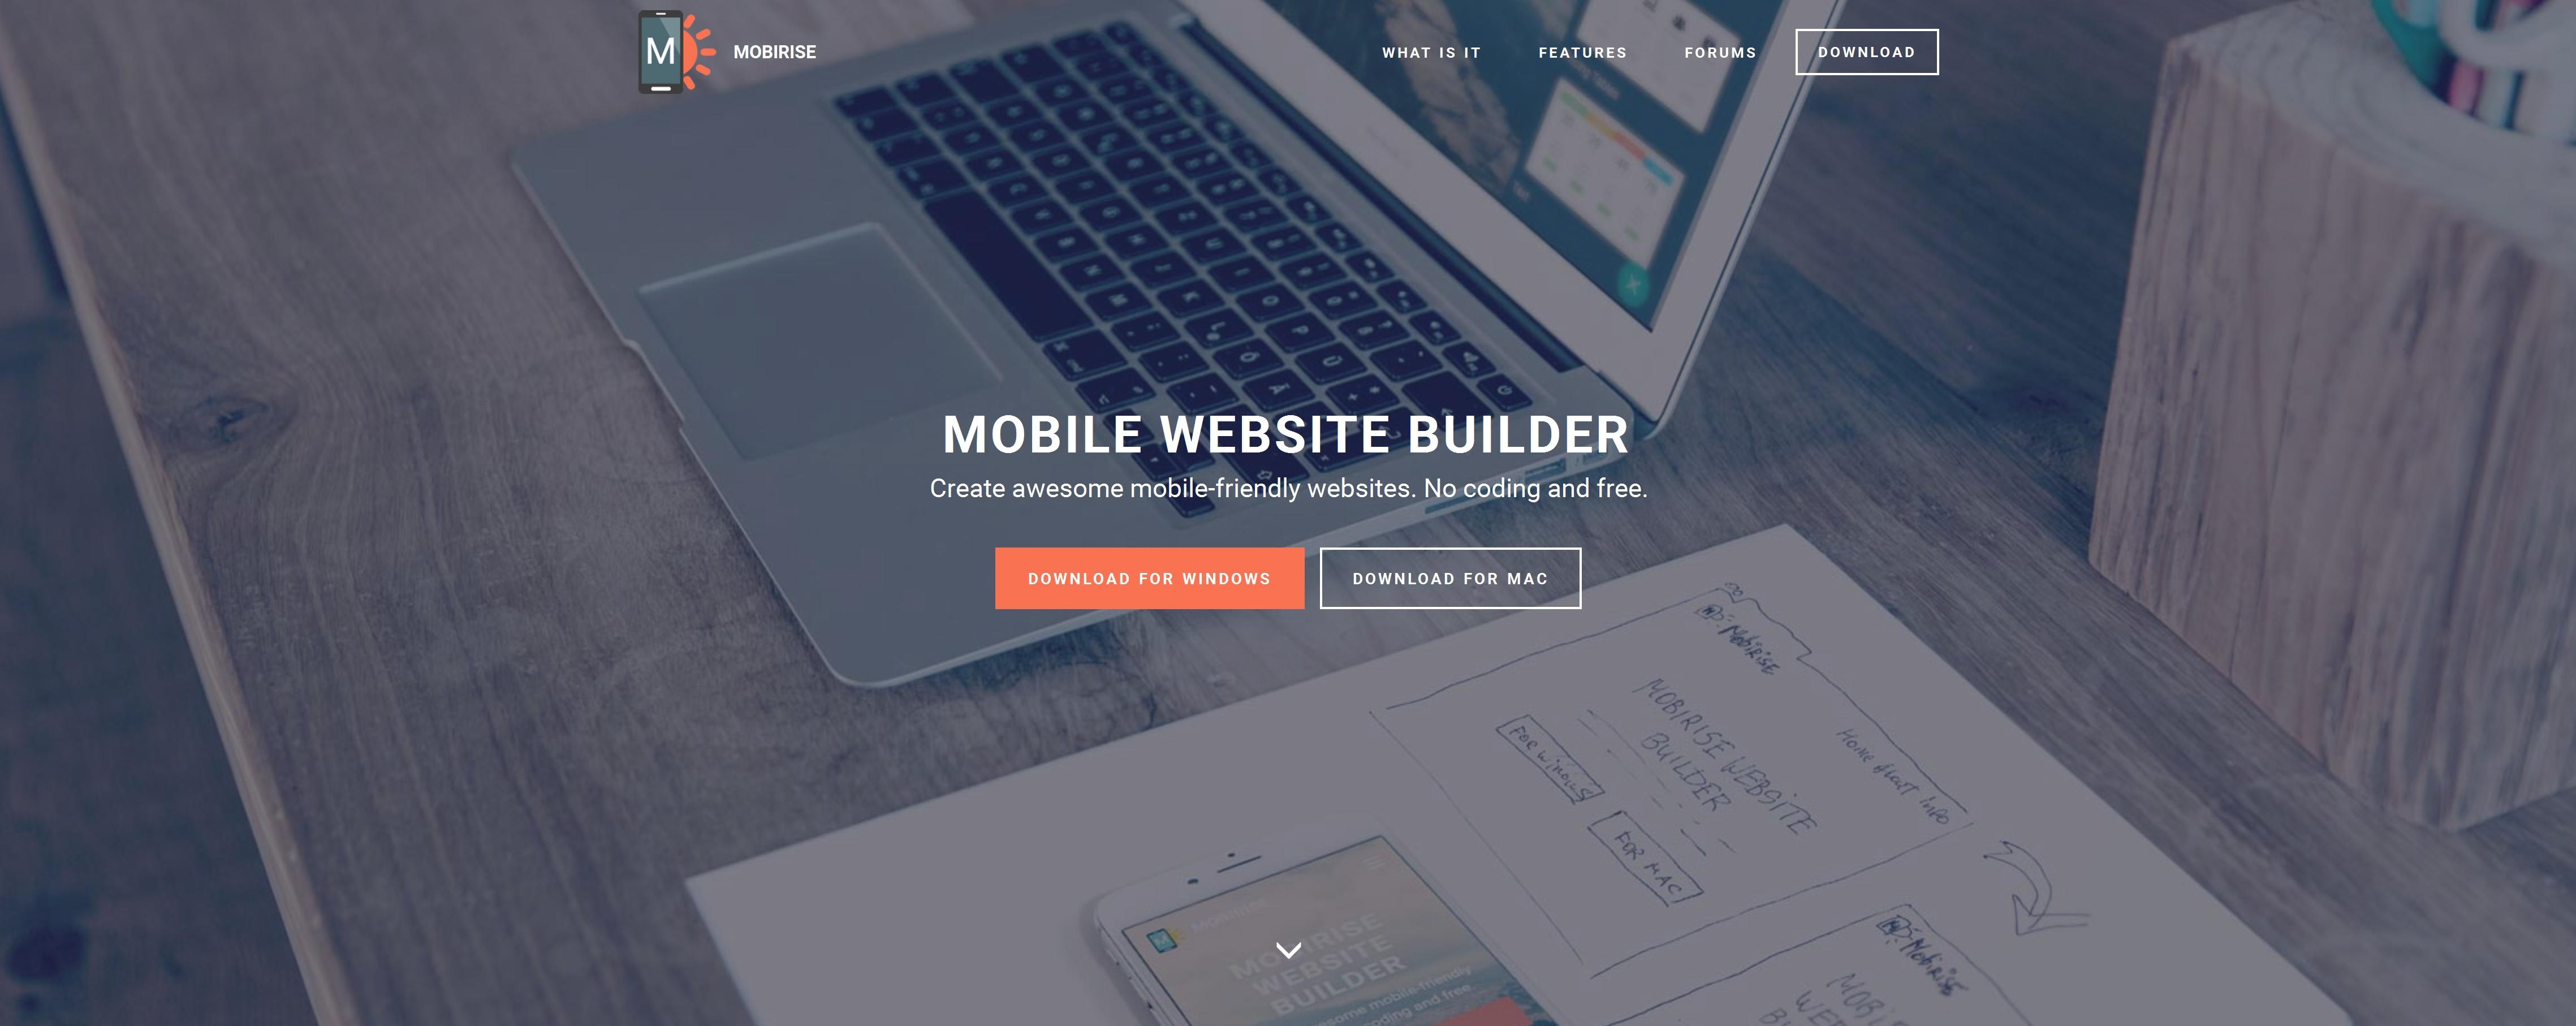 Bootstrap Mobile Website Creator Software